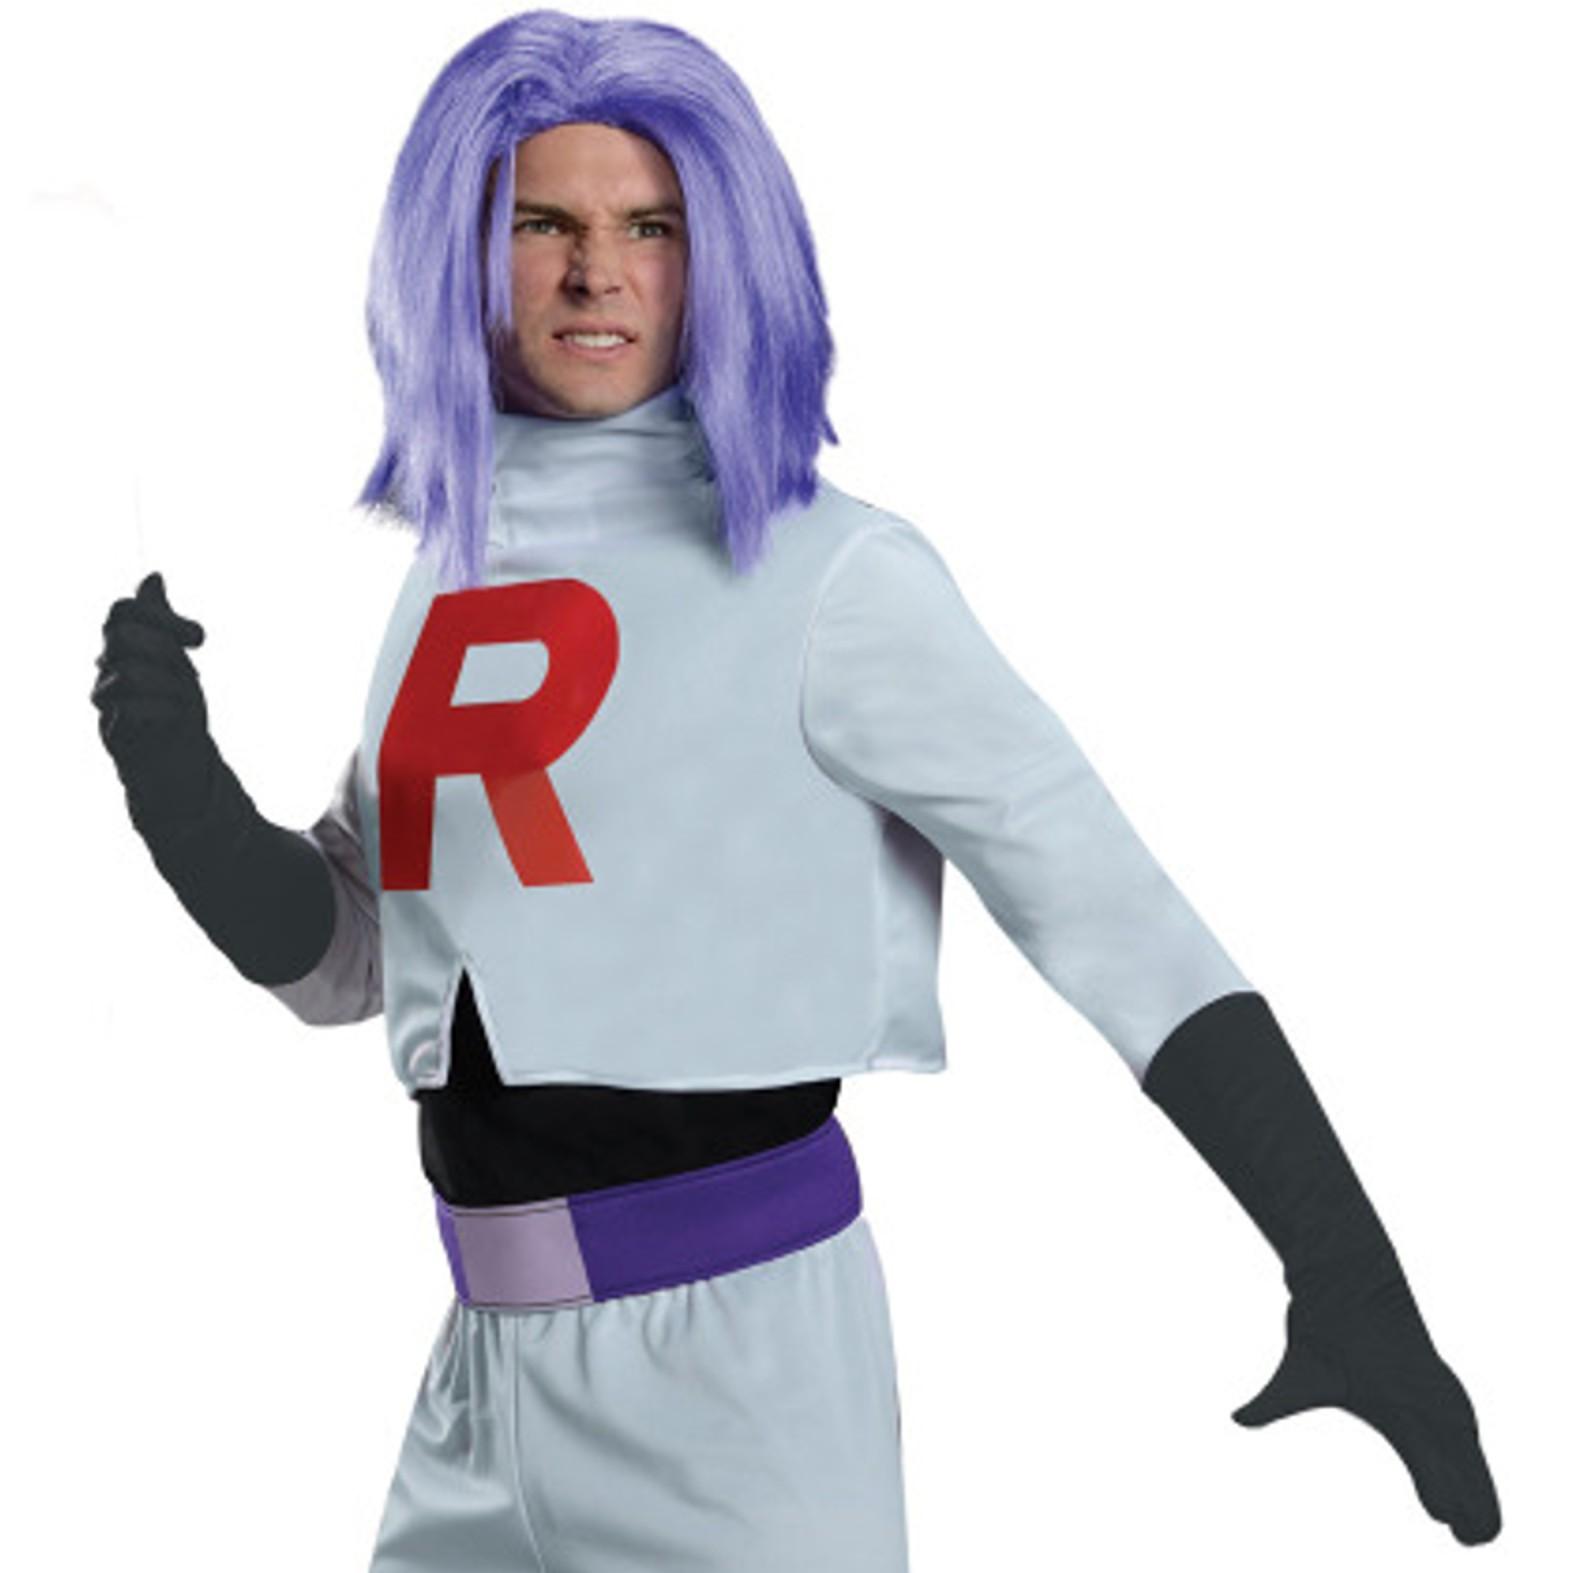 James Team Rocket Pokemon Costume